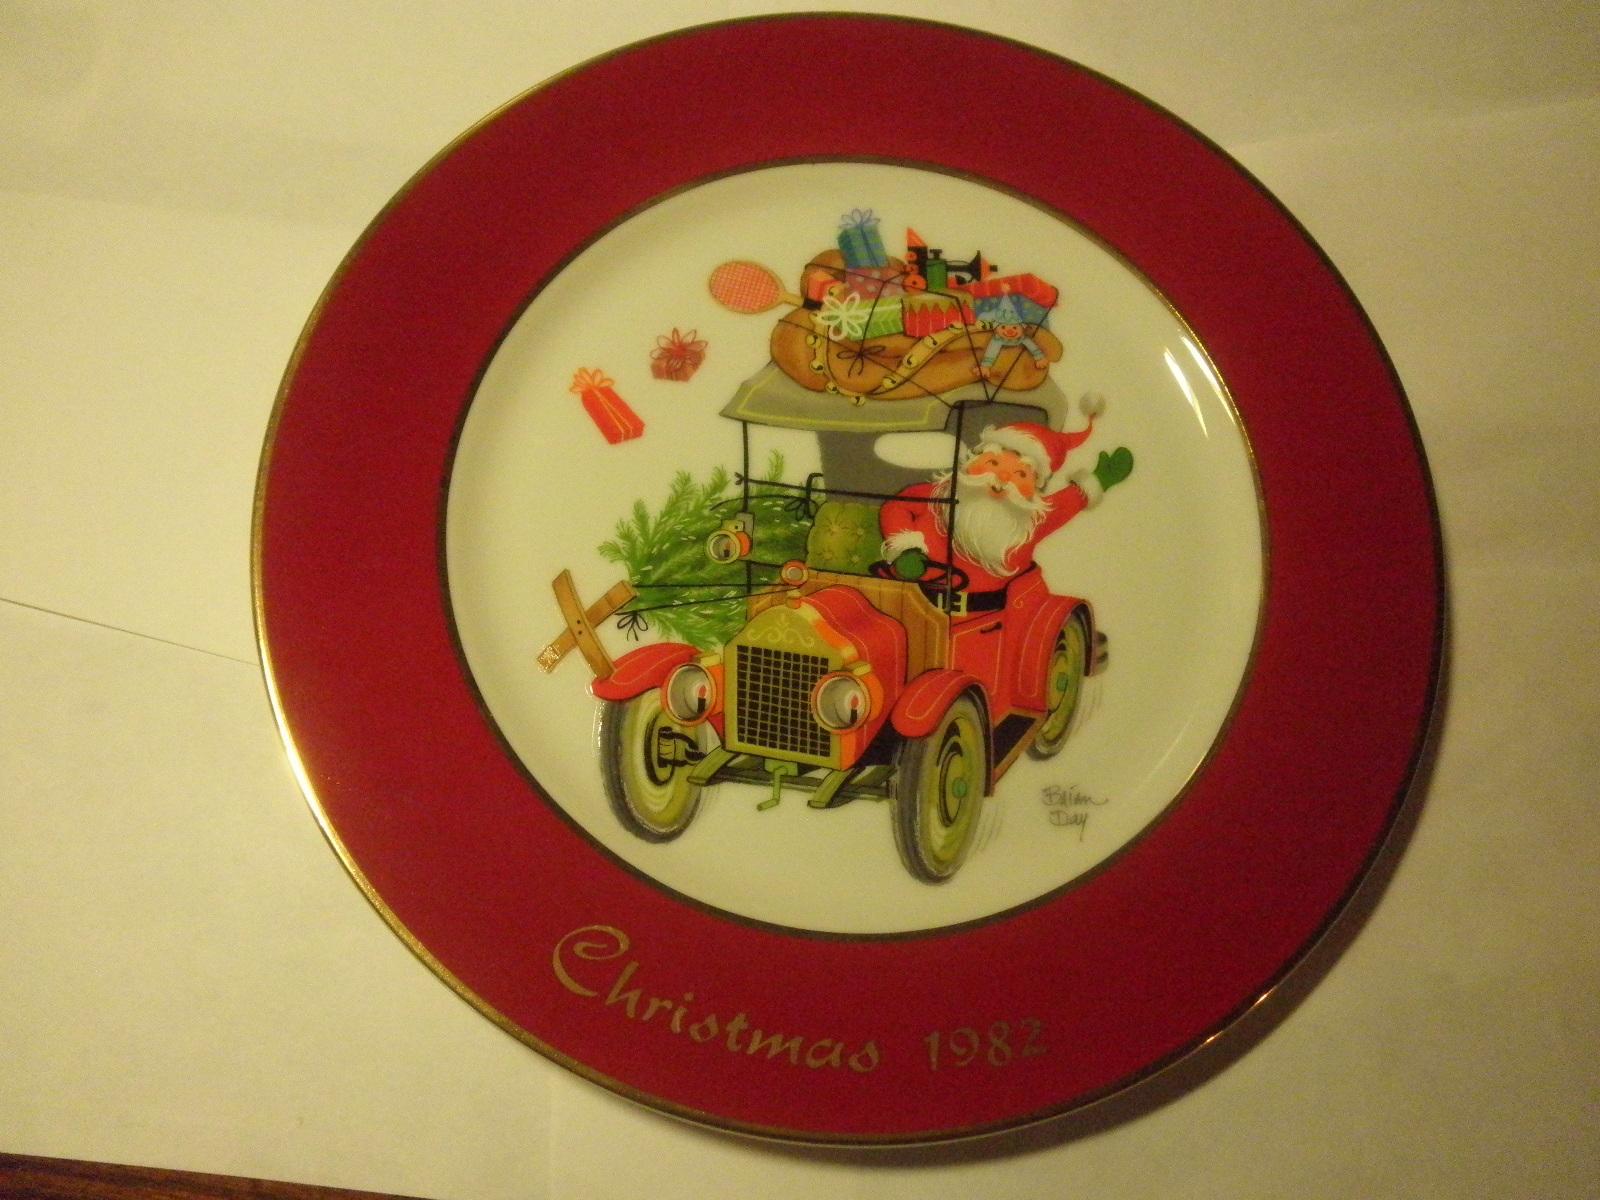 89+ 1982 Christmas Plate - 1982 Snoopy Christmas Plate Schmid ...